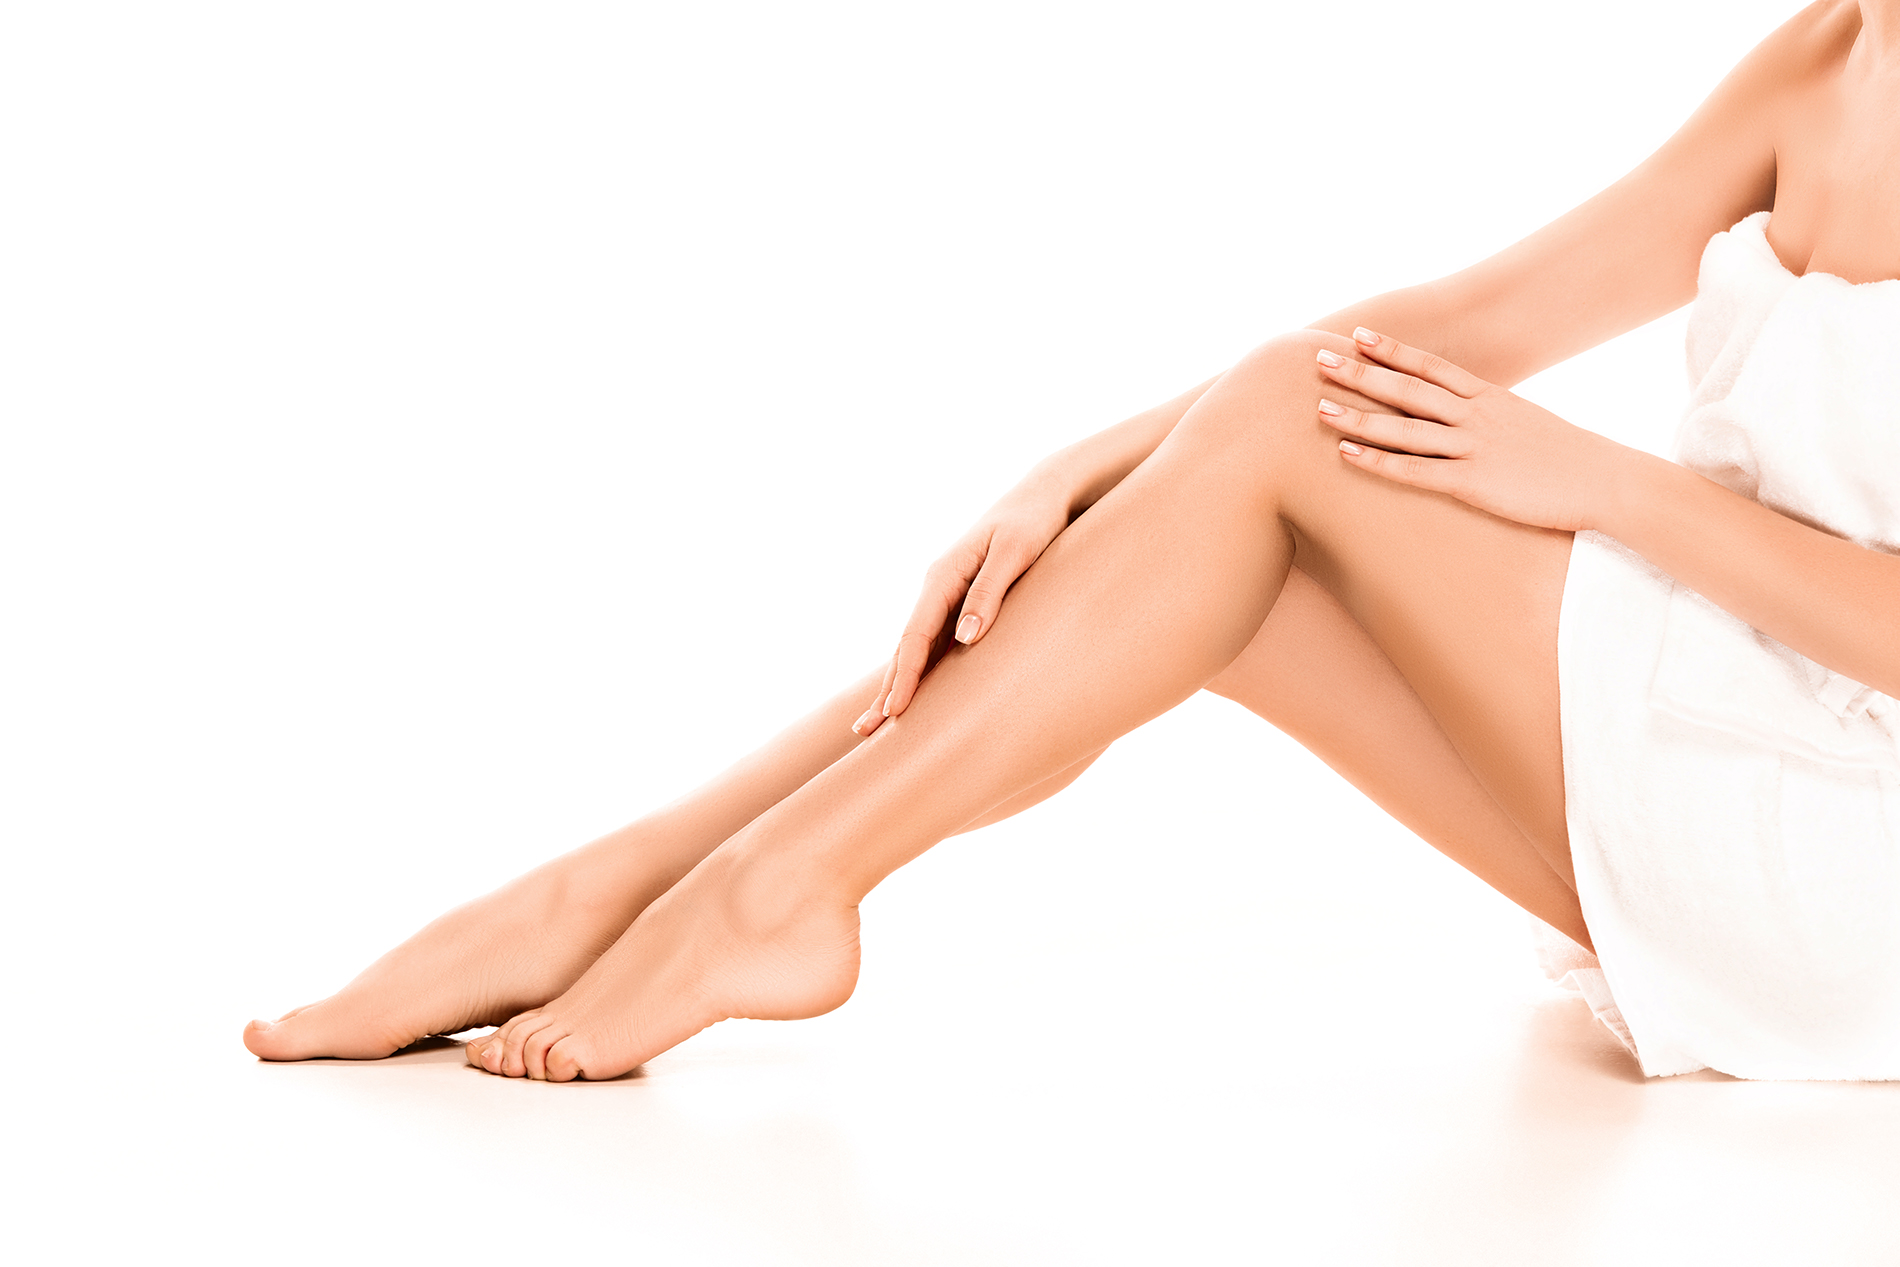 hair-removal-burlington-body-language-esthetics